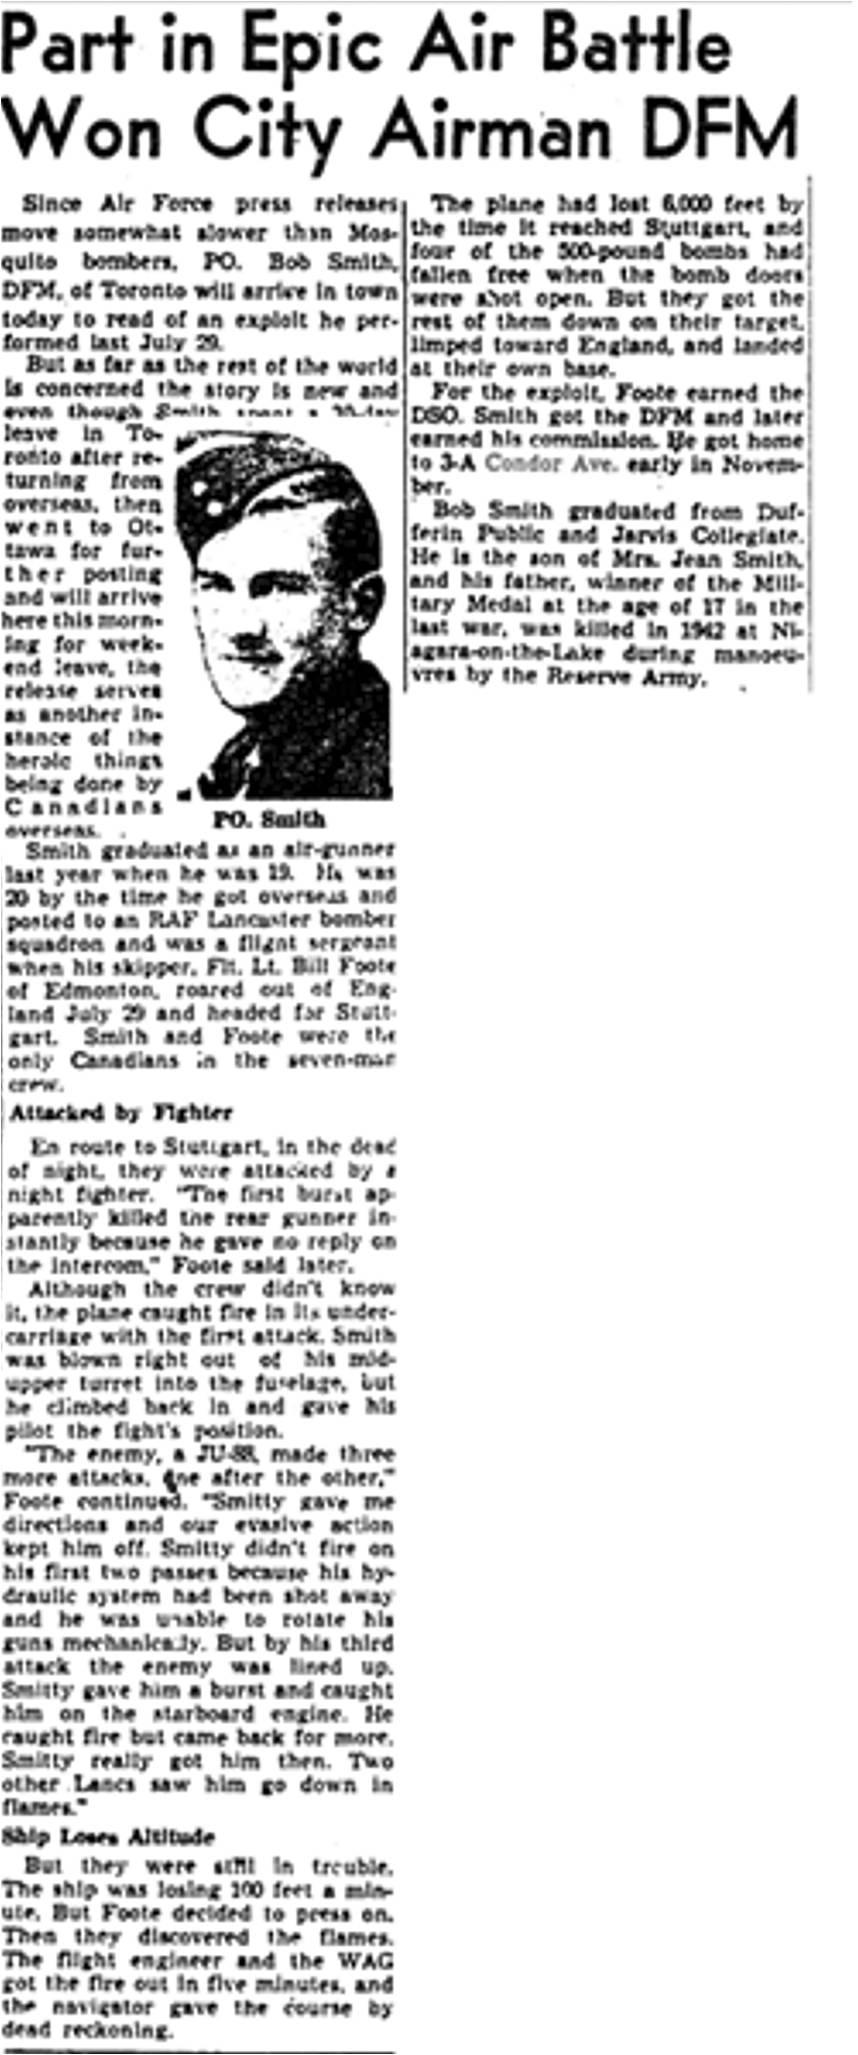 Globe and Mail, 09 Dec 1944 Condor Ave